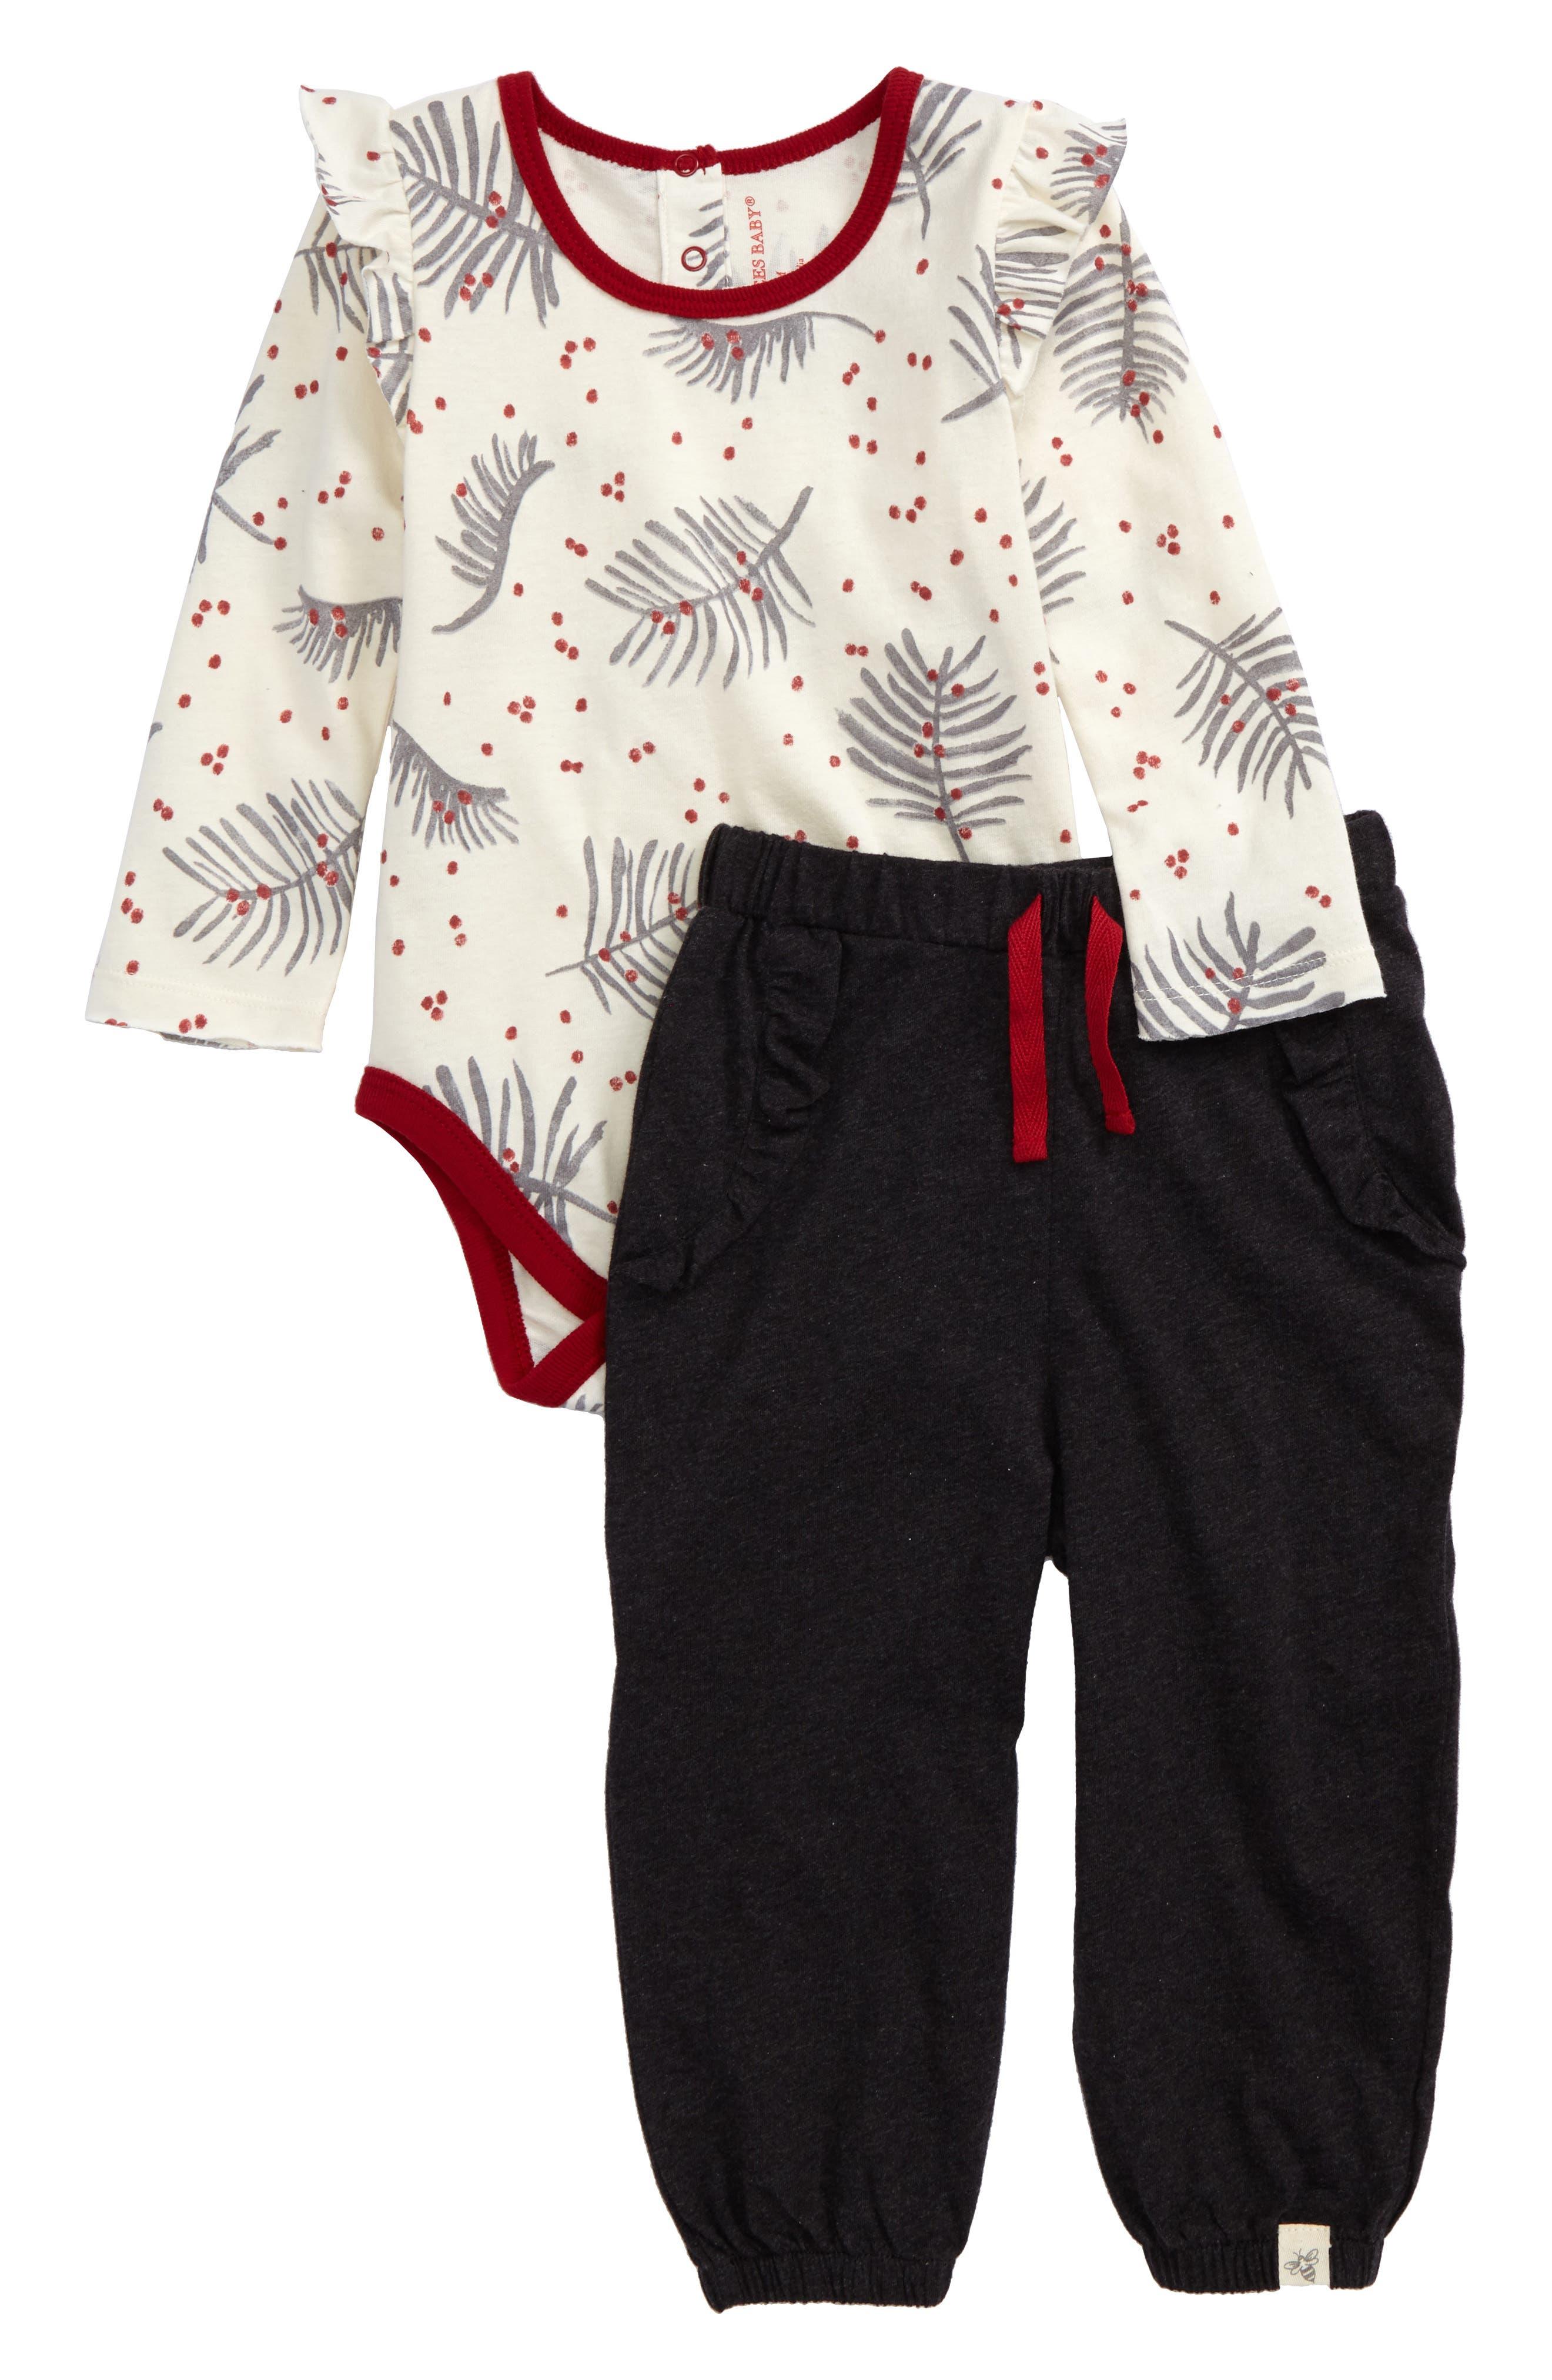 Burt's Bees Baby Organic Cotton Bodysuit & Pants Set (Baby Girls)